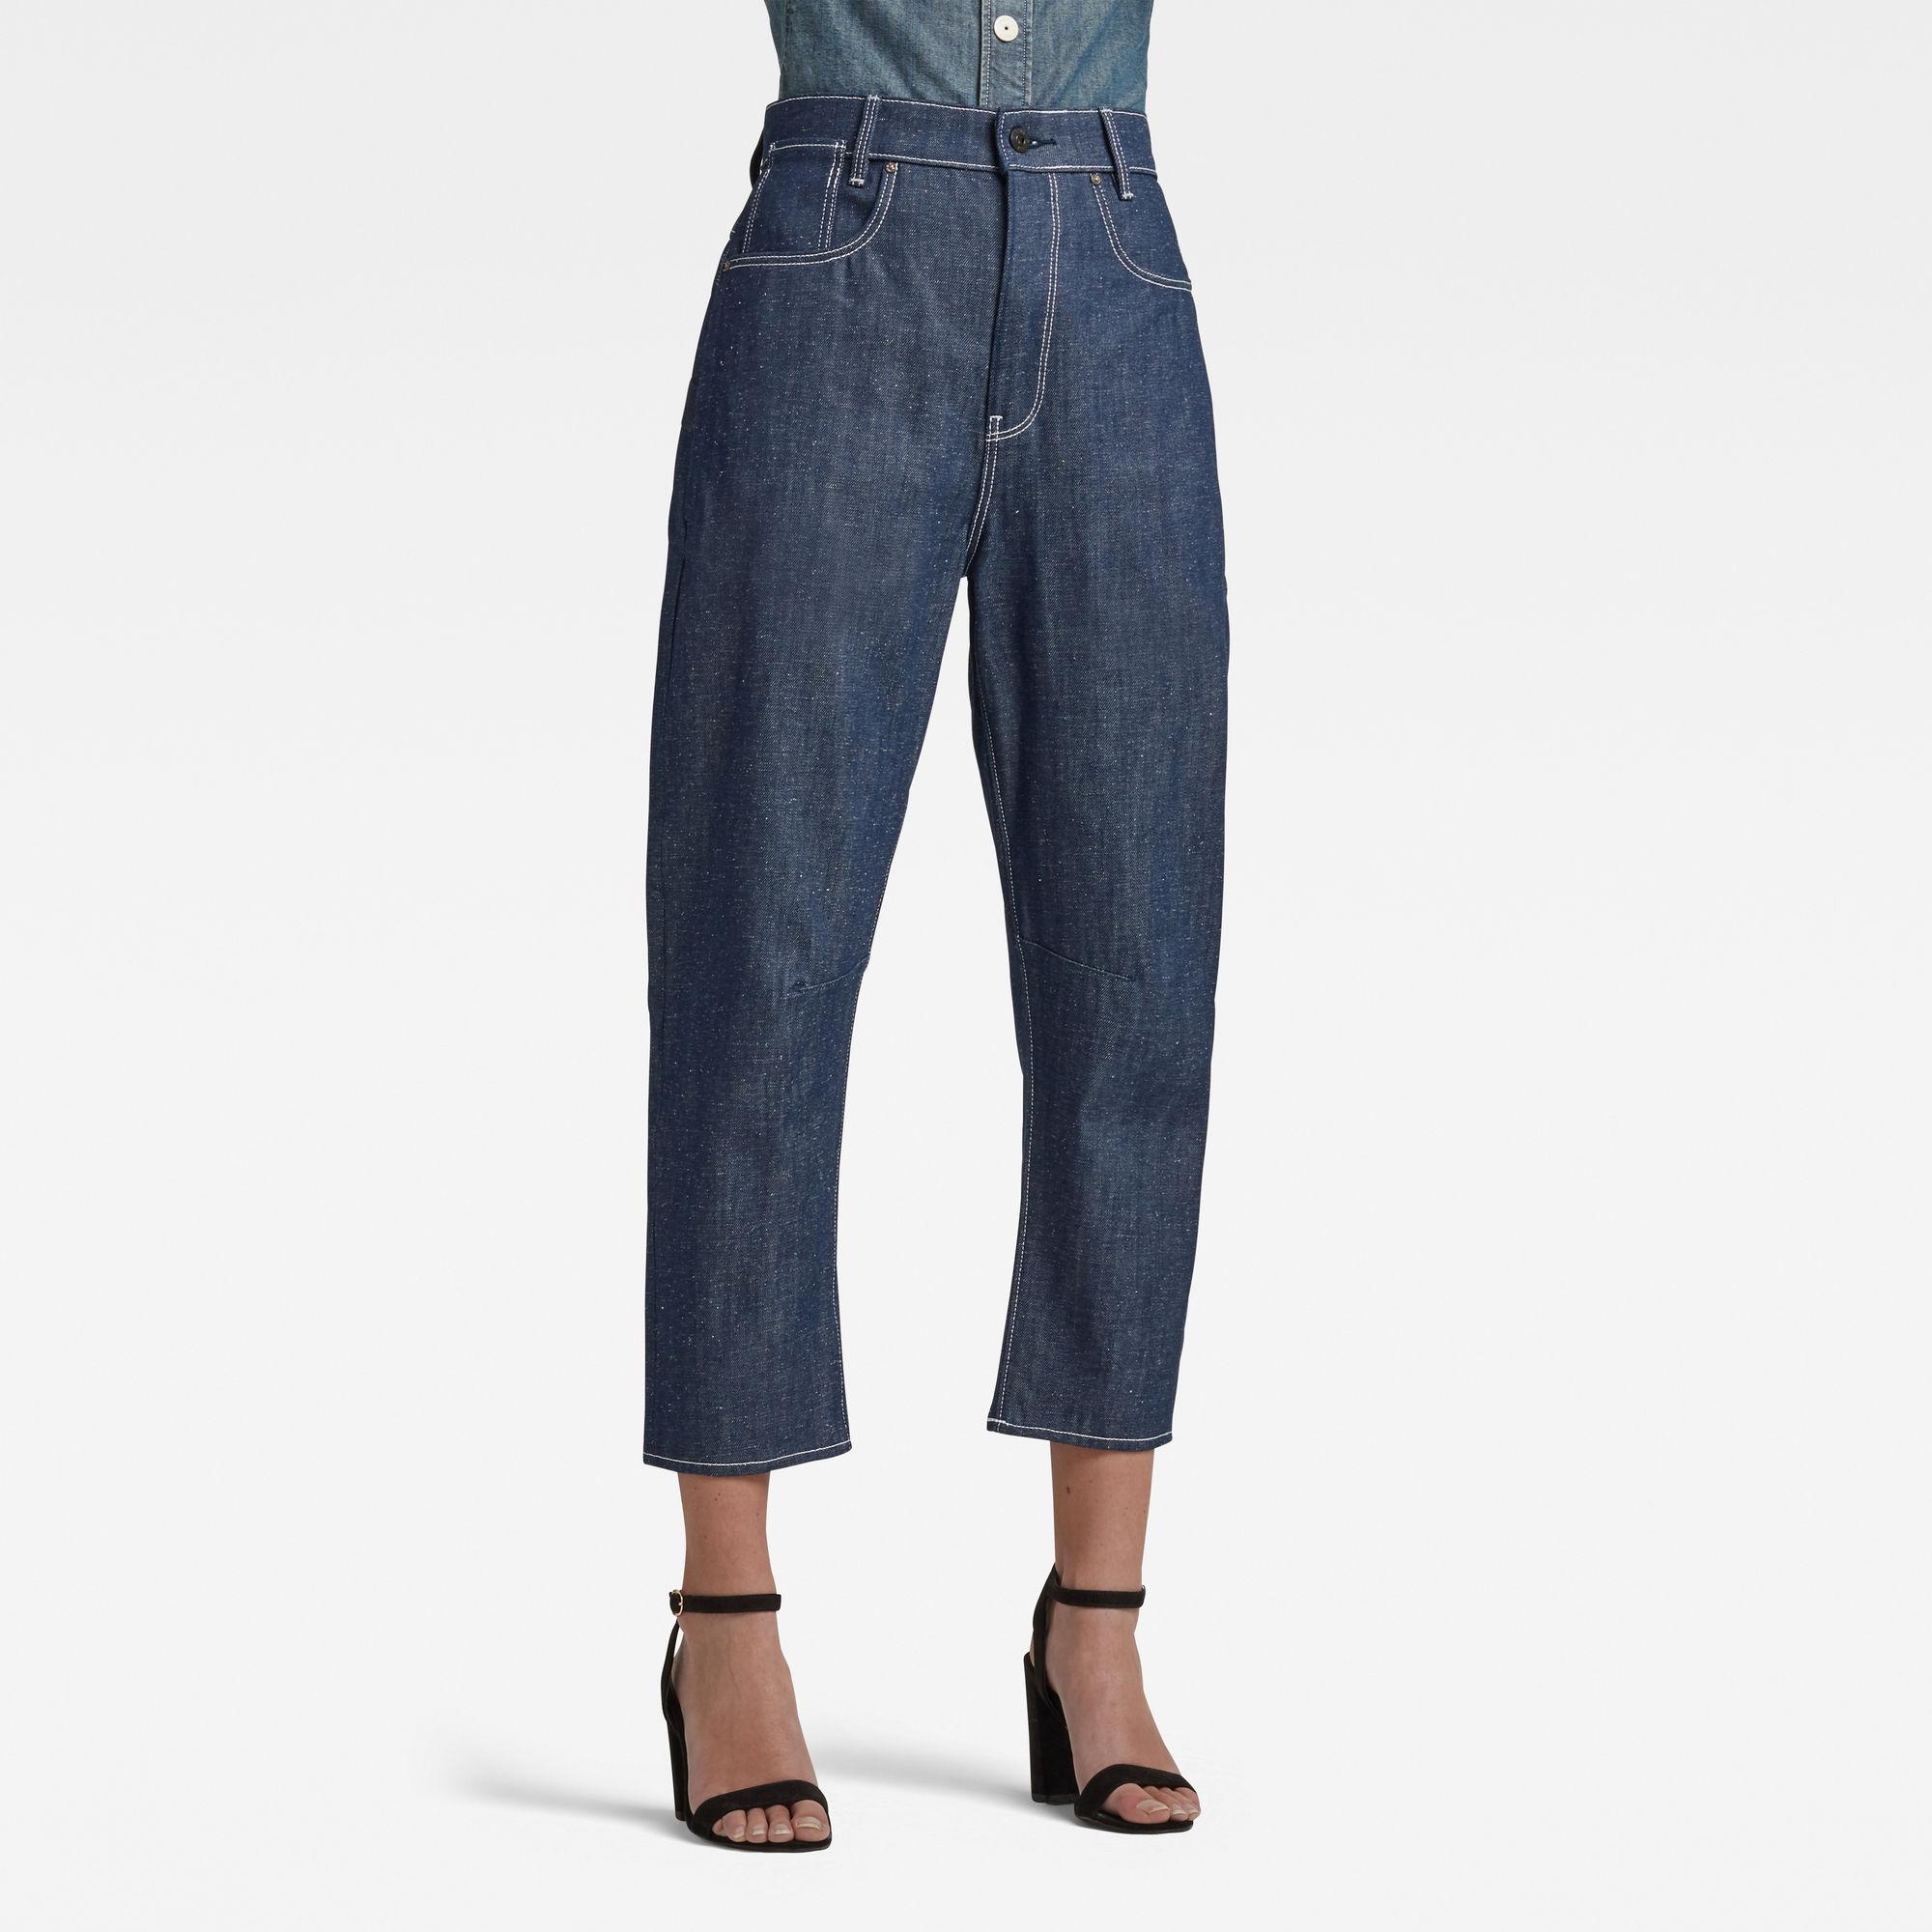 G-Star RAW Dames C-Staq 3d Boyfriend Crop Jeans C Donkerblauw